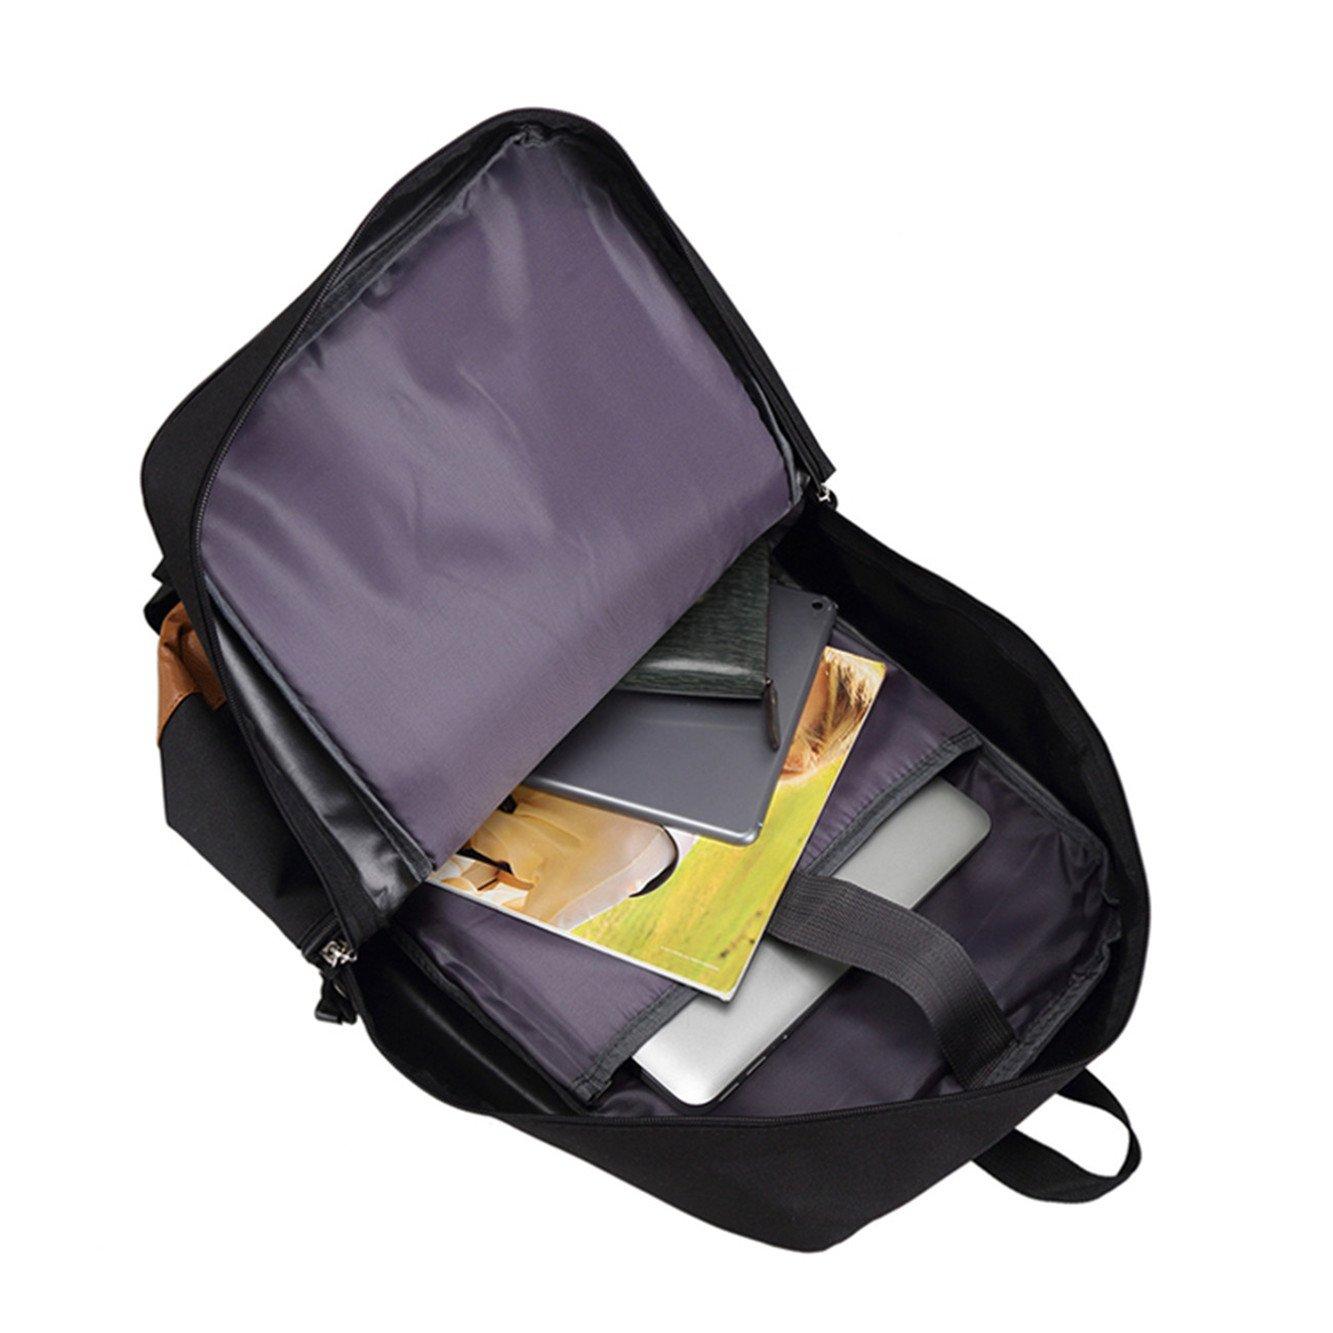 JUSTGOGO Luminous Korean Casual Backpack Daypack Laptop Bag College Bag School Bag (Black) by JUSTGOGO (Image #4)